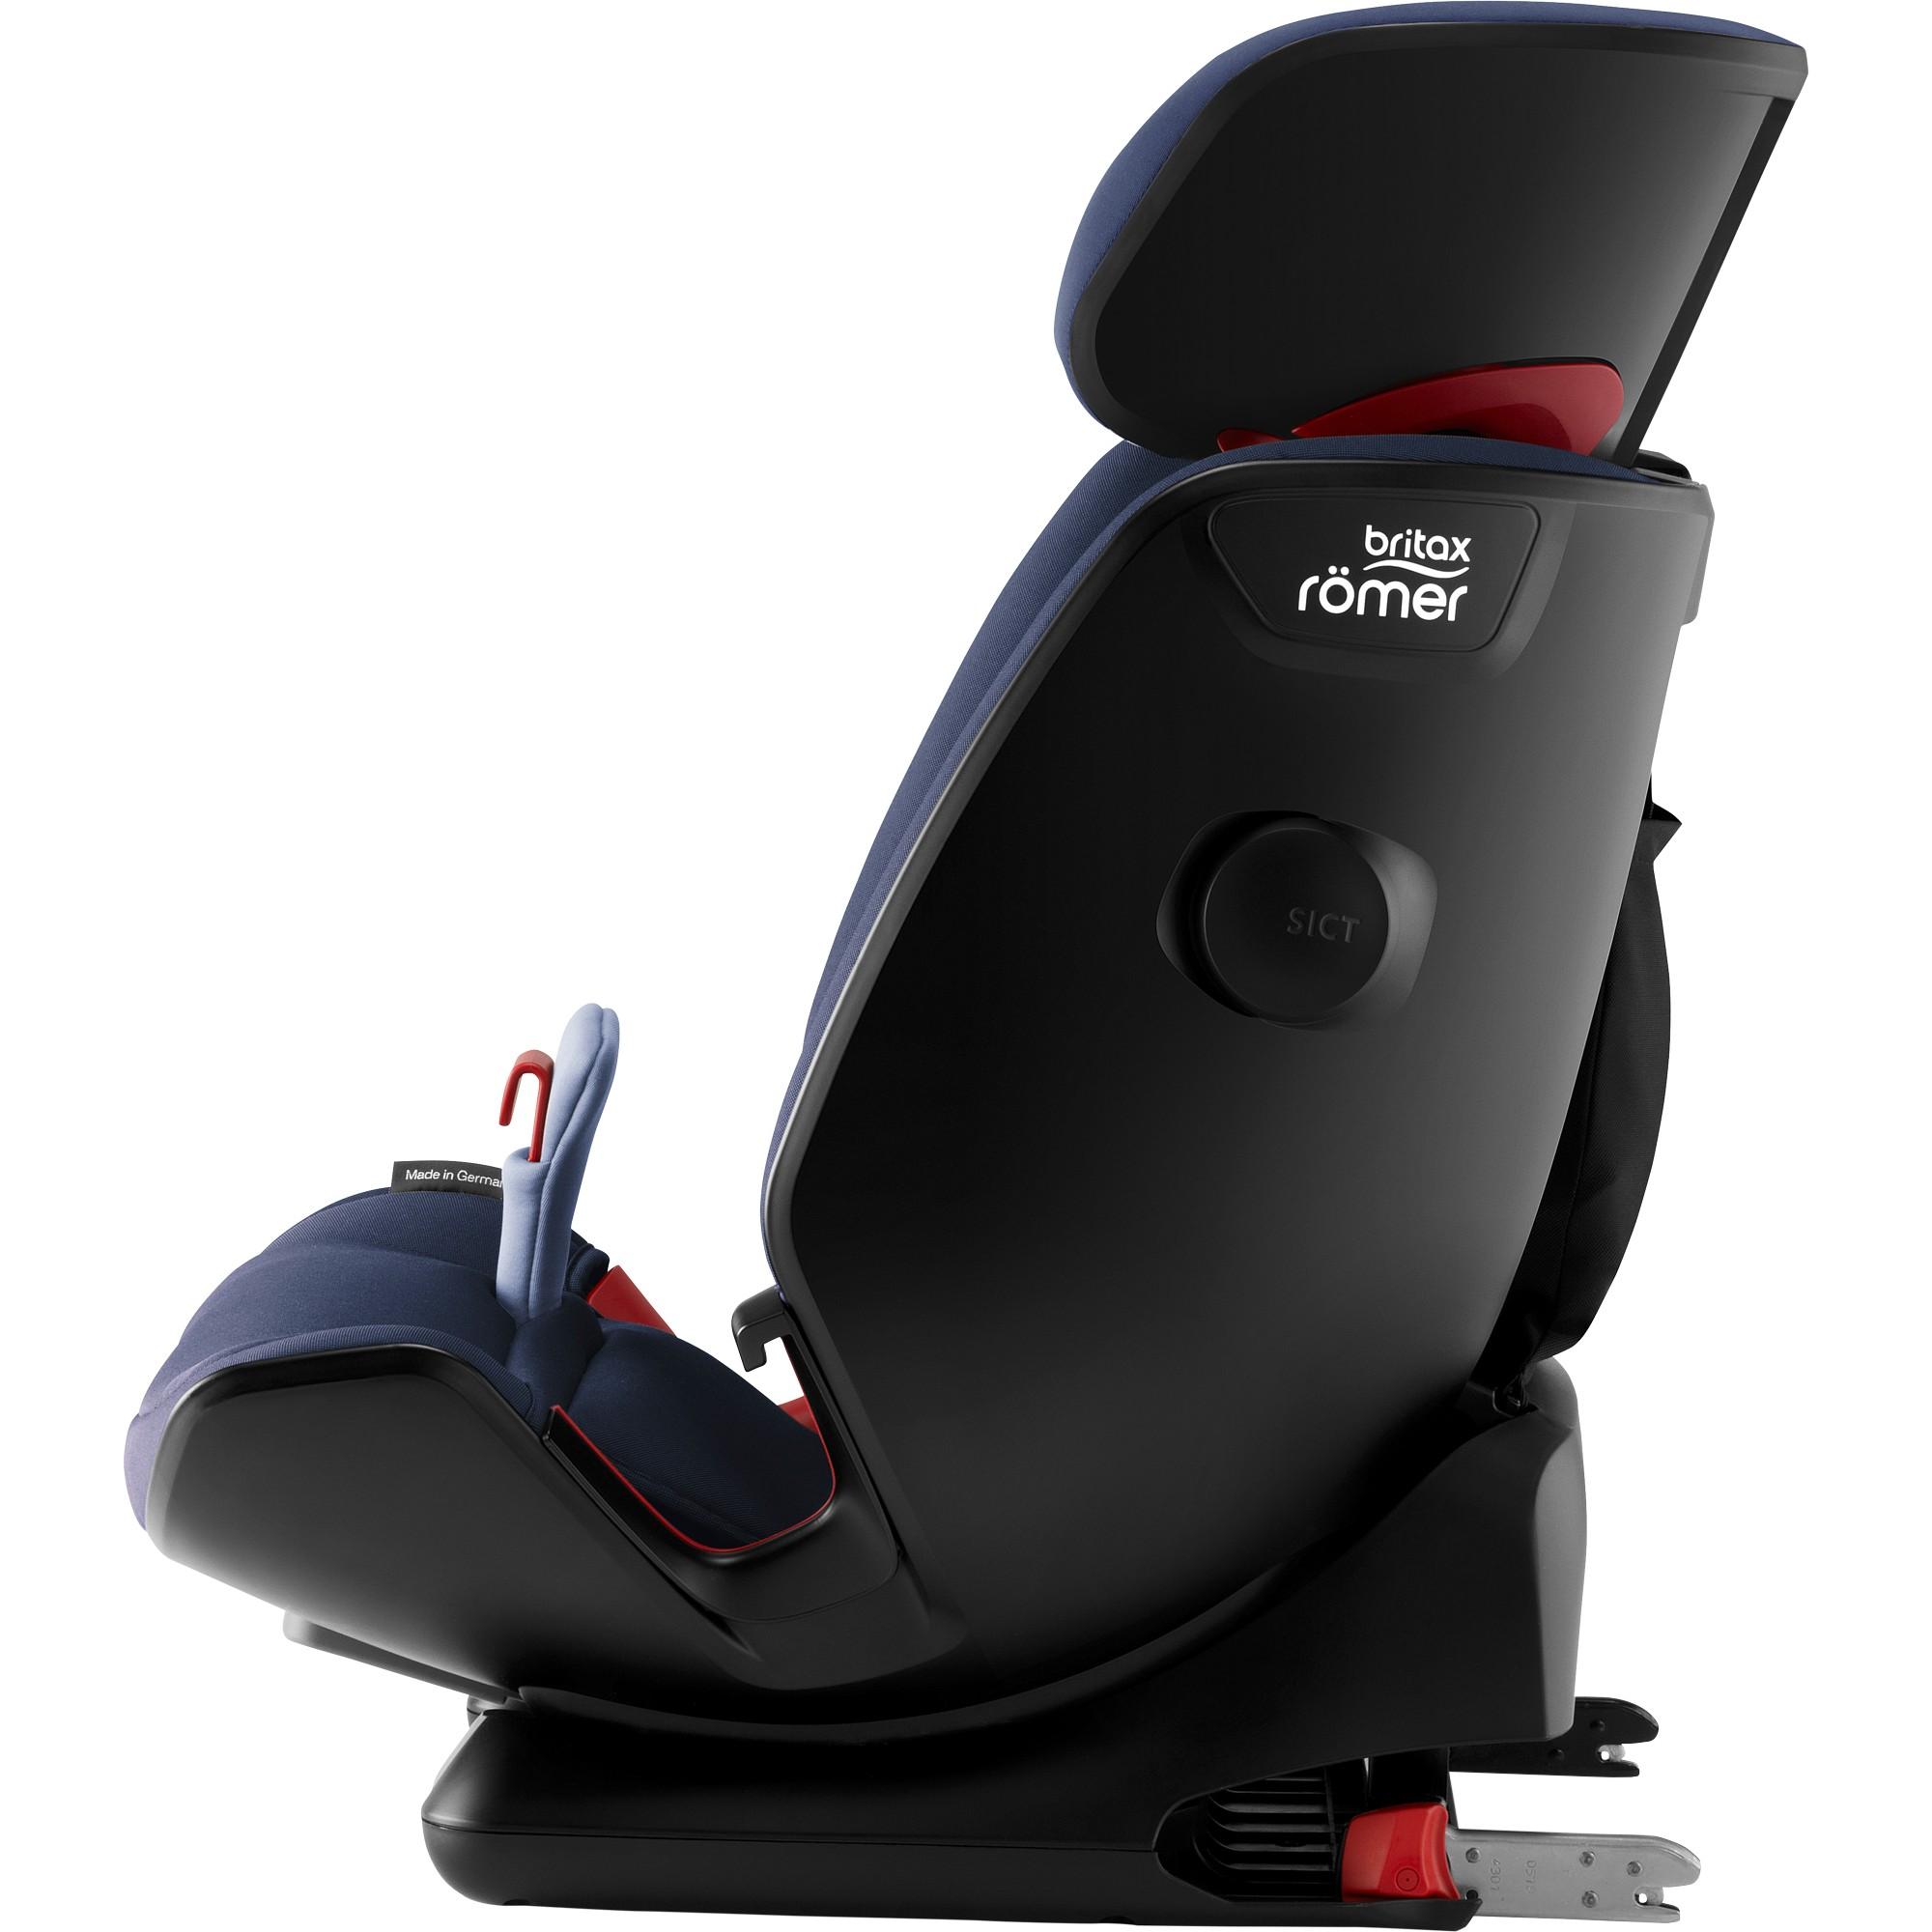 Britax-Romer-ADVANSAFIX-IV-R-Group-1-2-3-Child-Car-Seat thumbnail 6